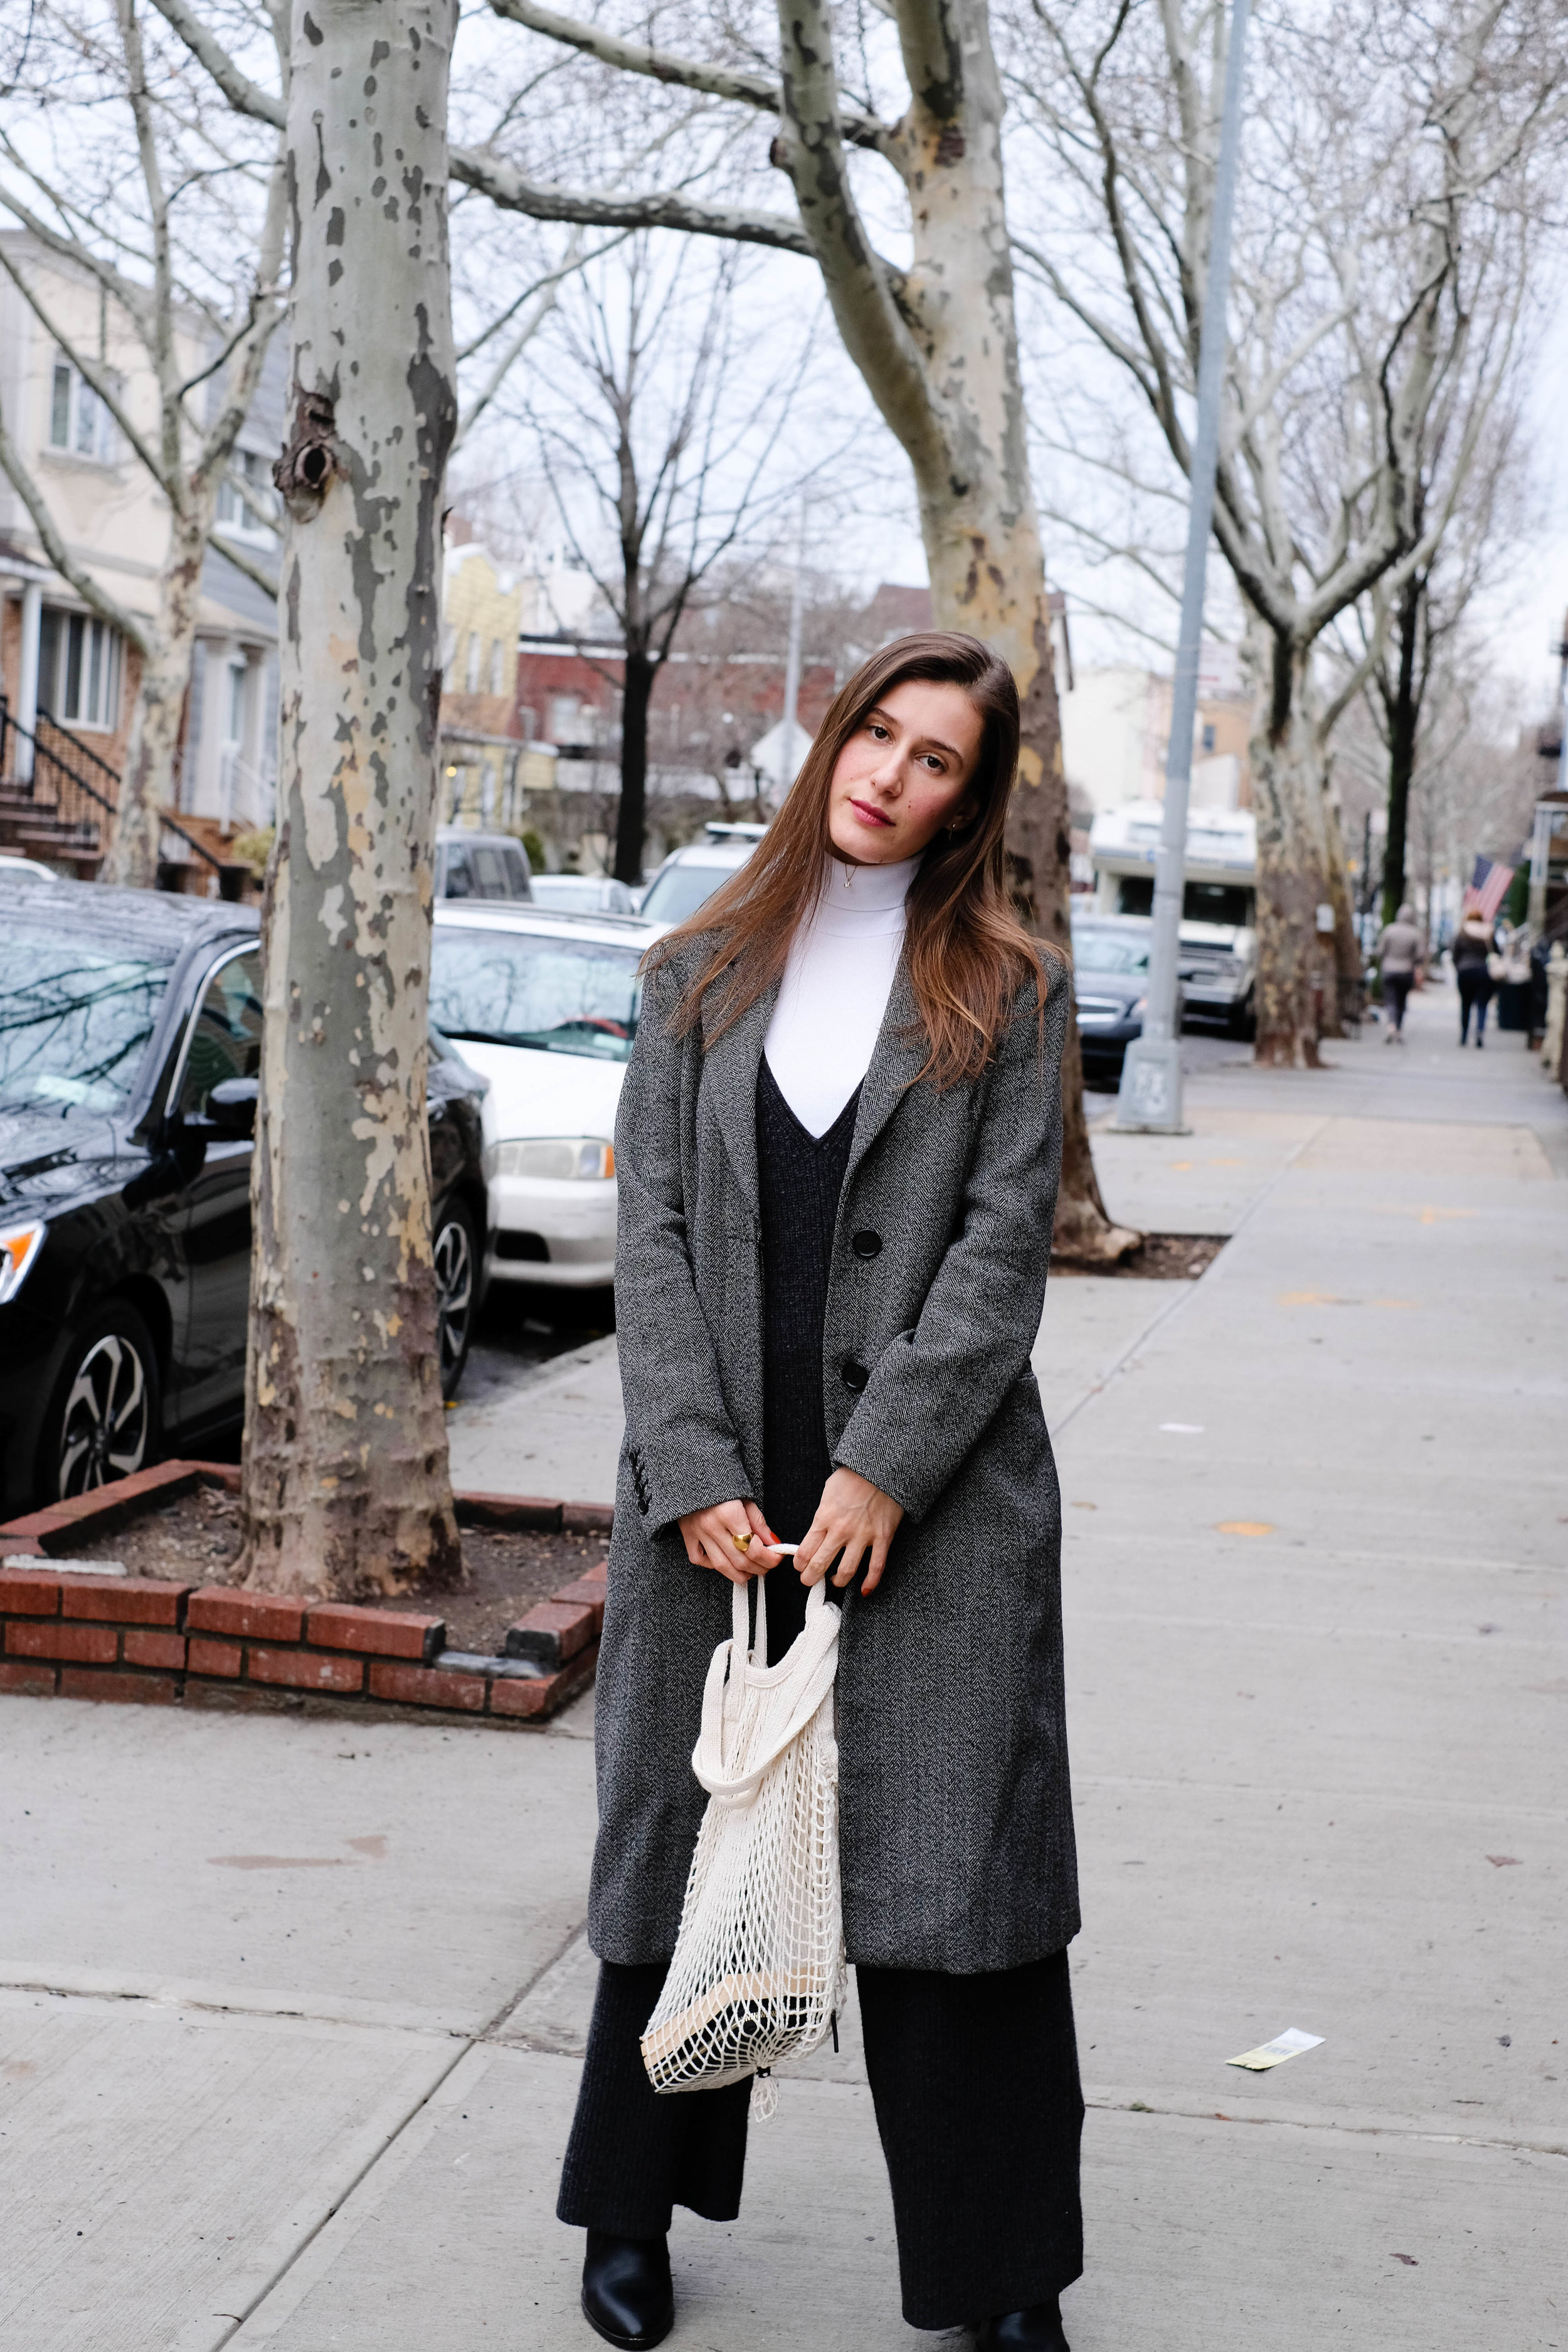 Wool Jumpsuit, Madewell ;    Turtleneck, Everlane    ; Coat, Vintage ; Bag, Grocery Store in Chinatown